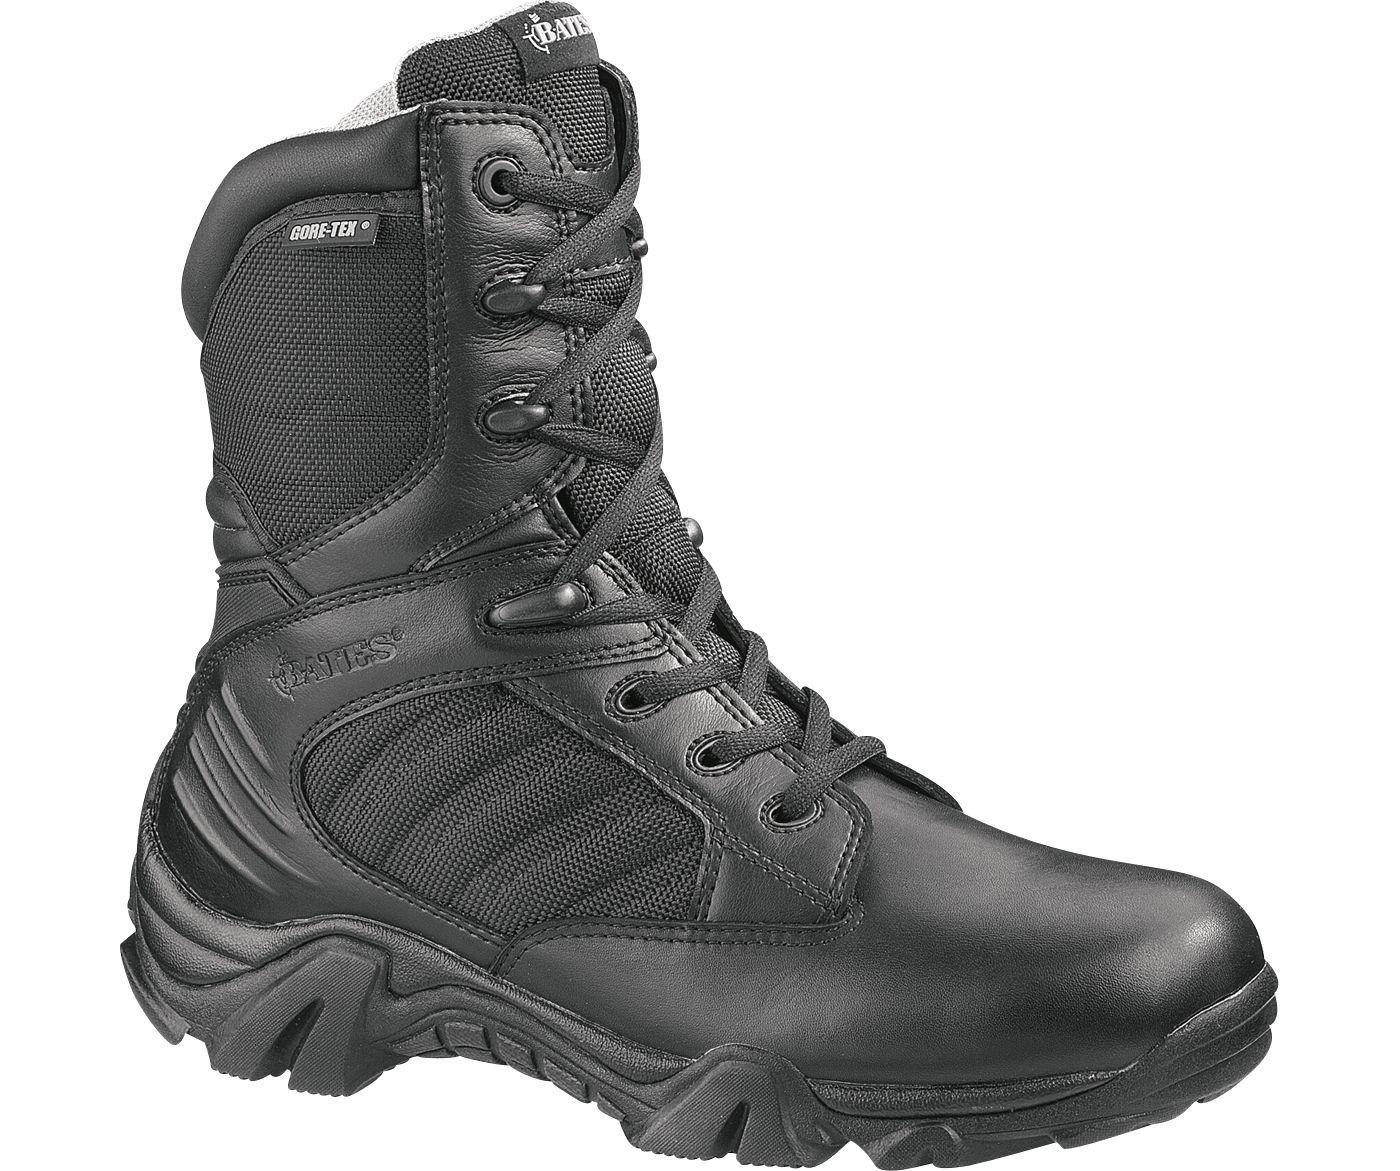 Bates Men's GX-8 8'' GORE-TEX 200g Side Zip Work Boots